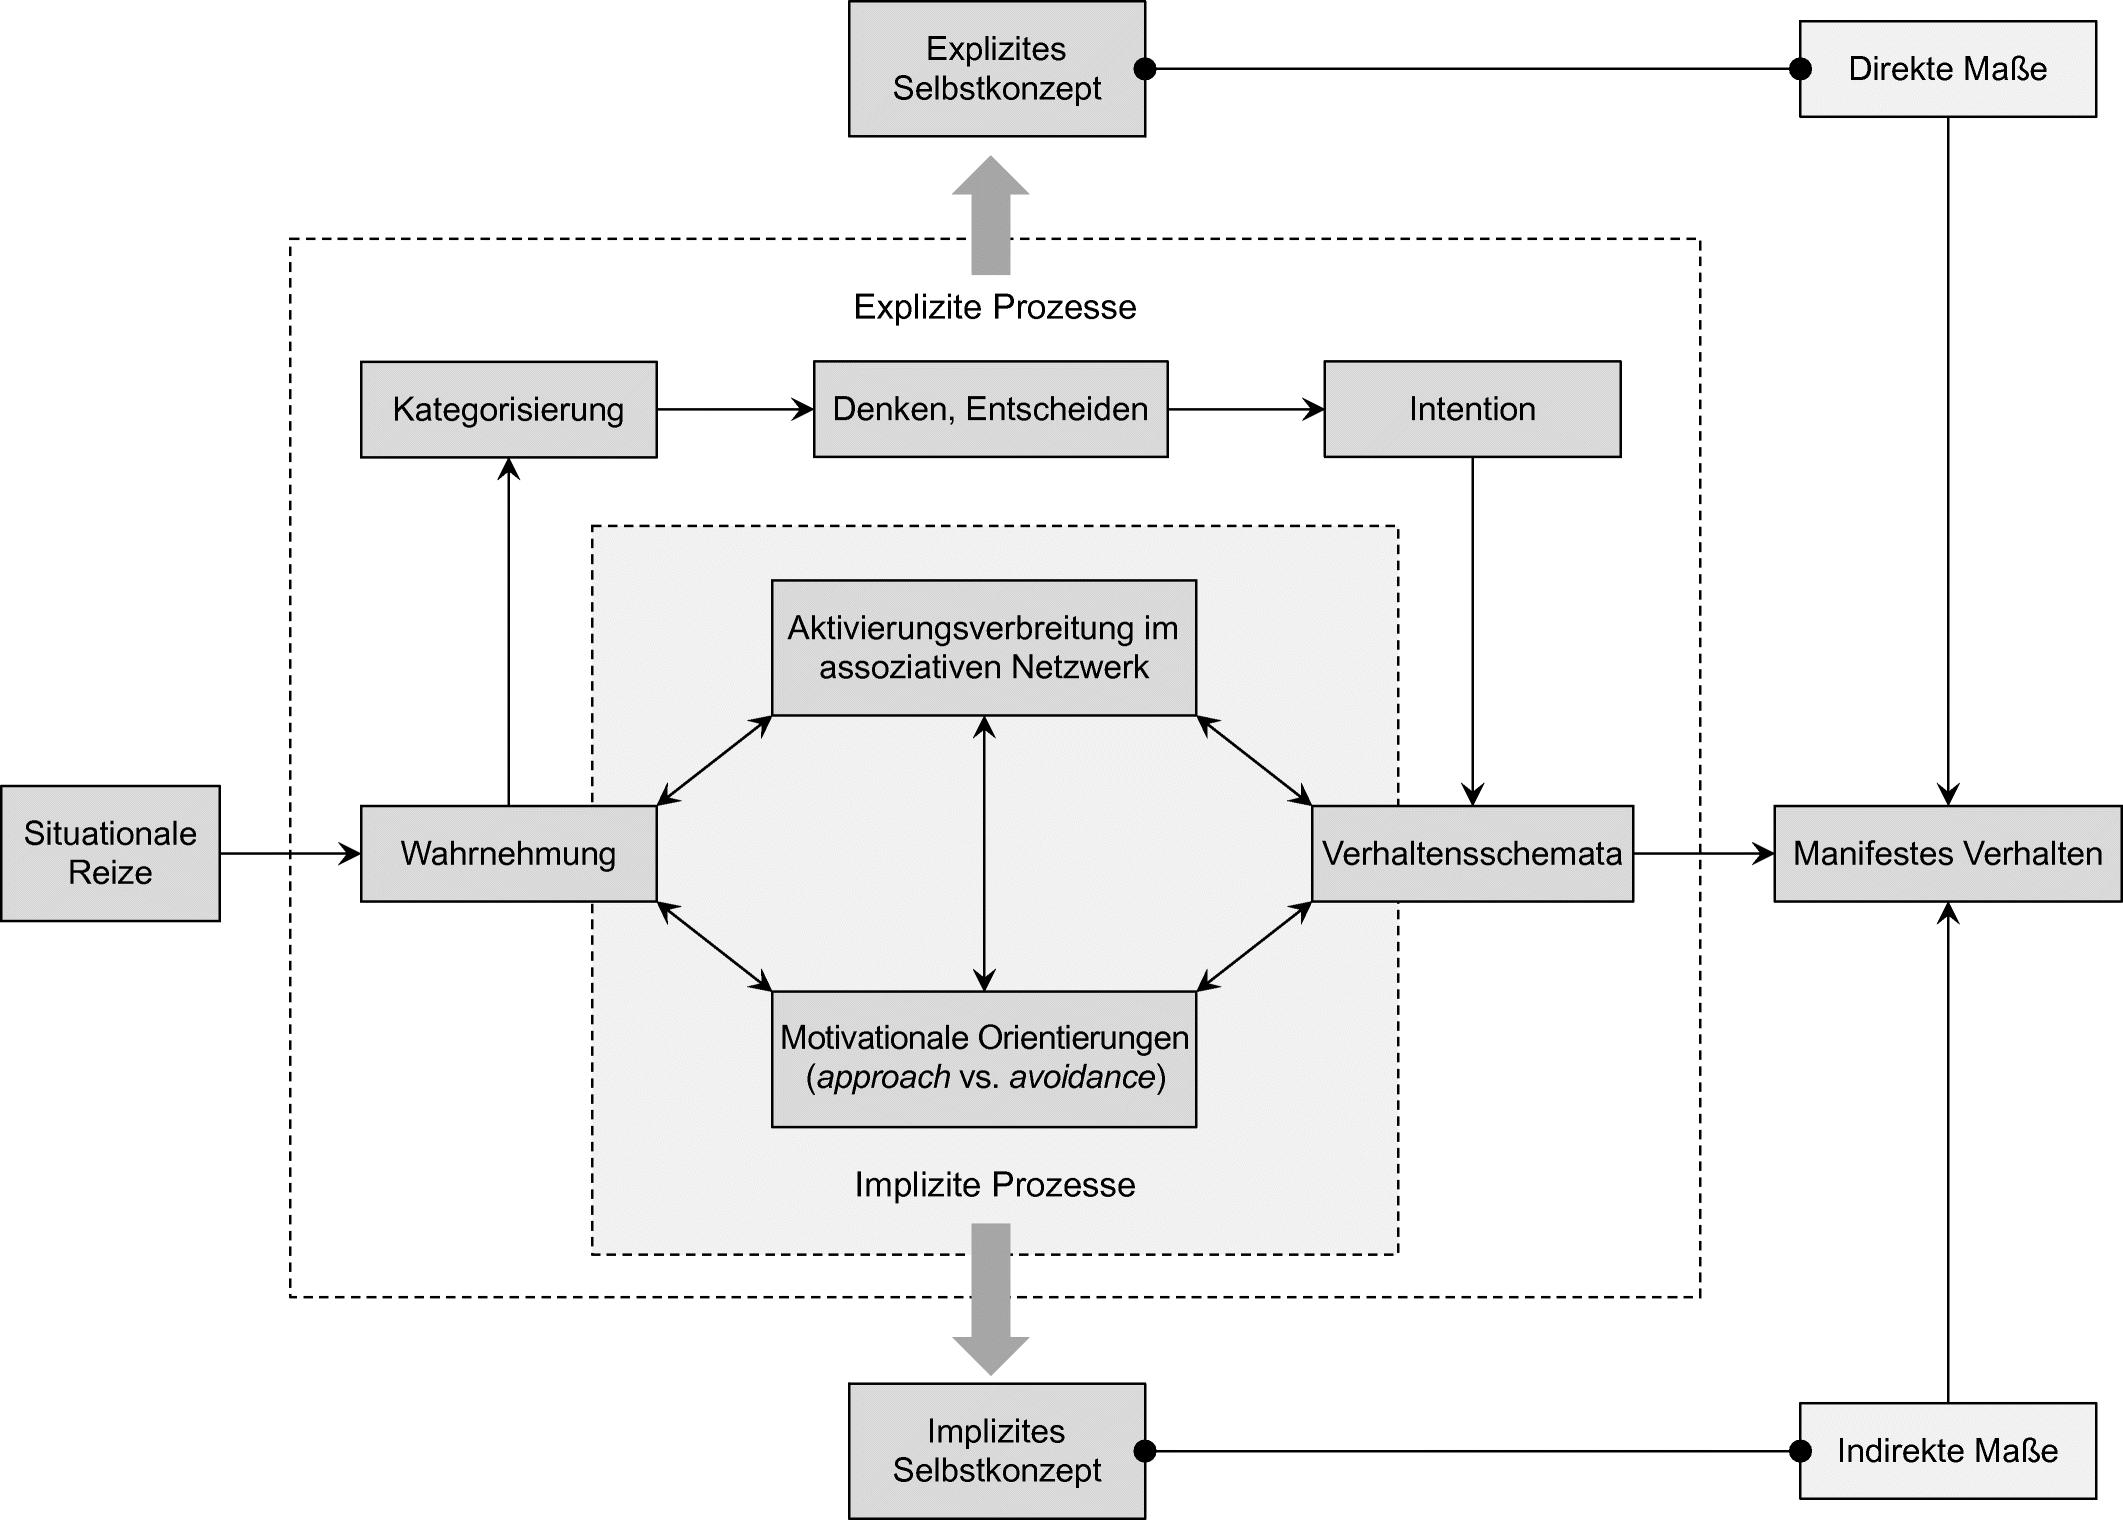 Dispositionales Paradigma Springerlink